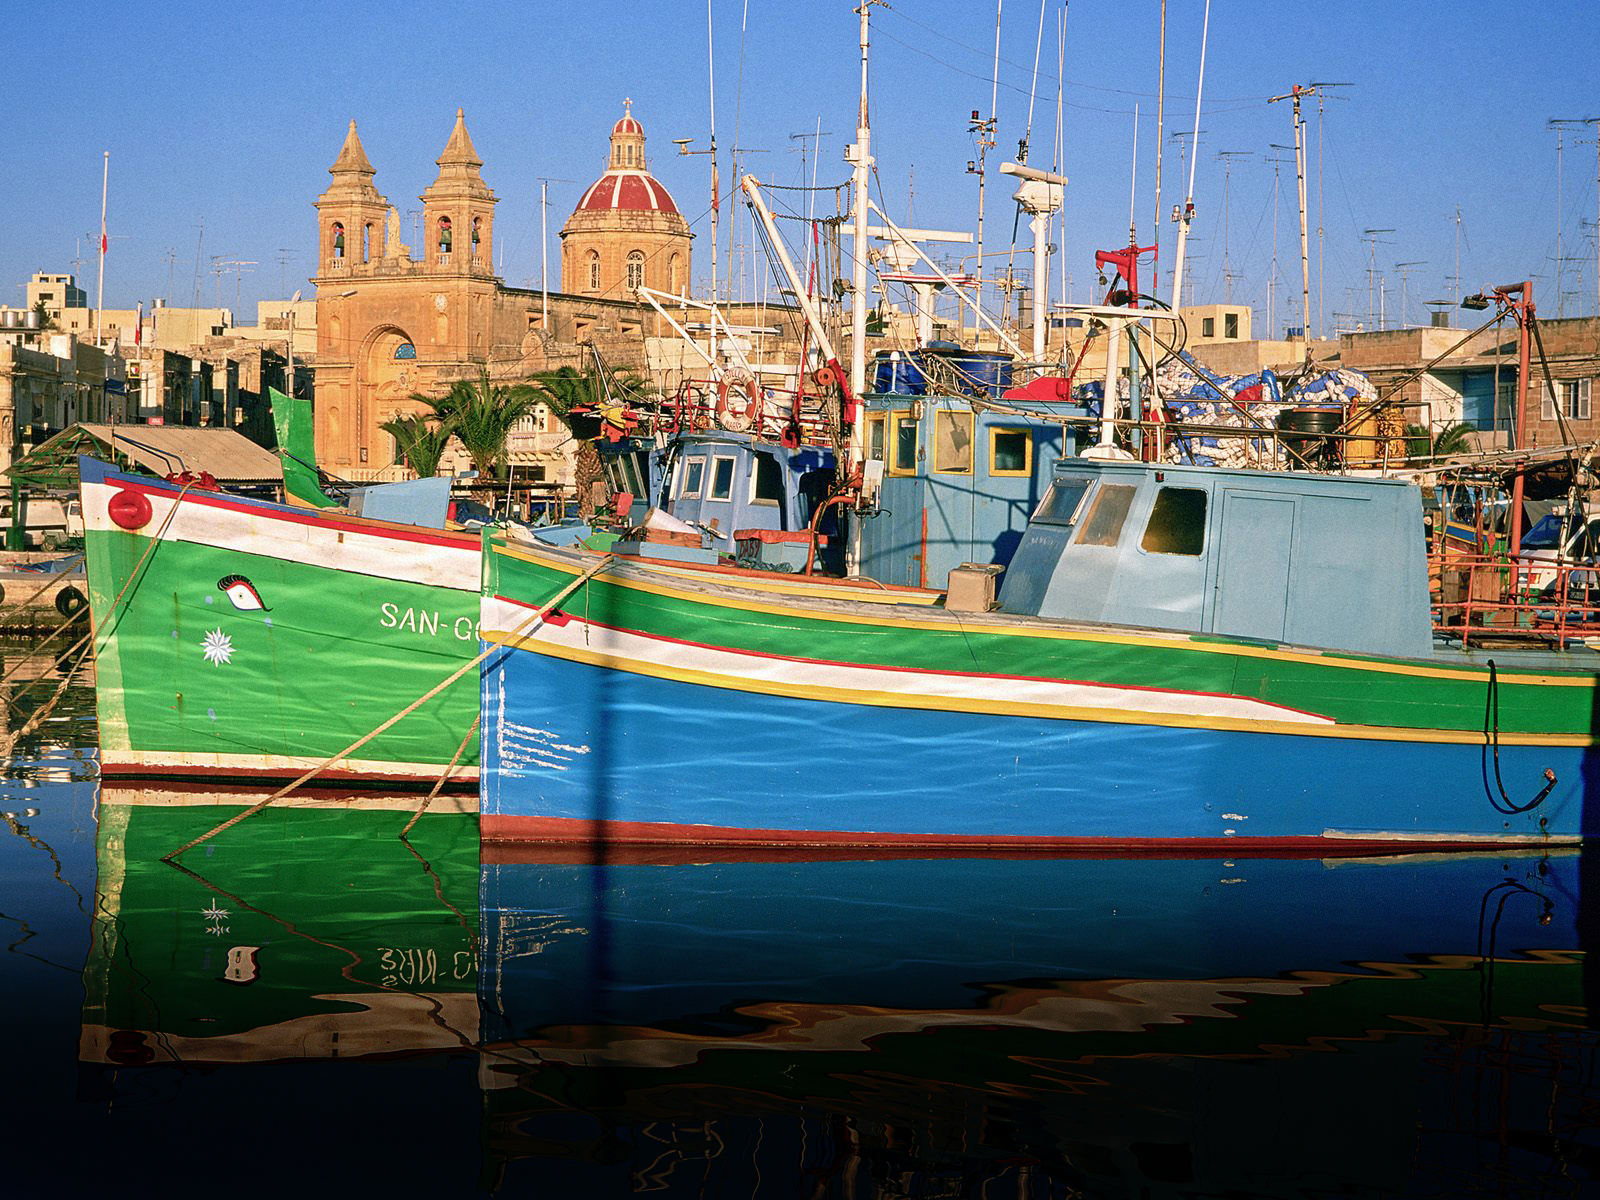 Обои Мальта, malta xlokk, malta, Залив, Marsaxlok, marsaxlokk bay, марсашлокк. Города foto 9